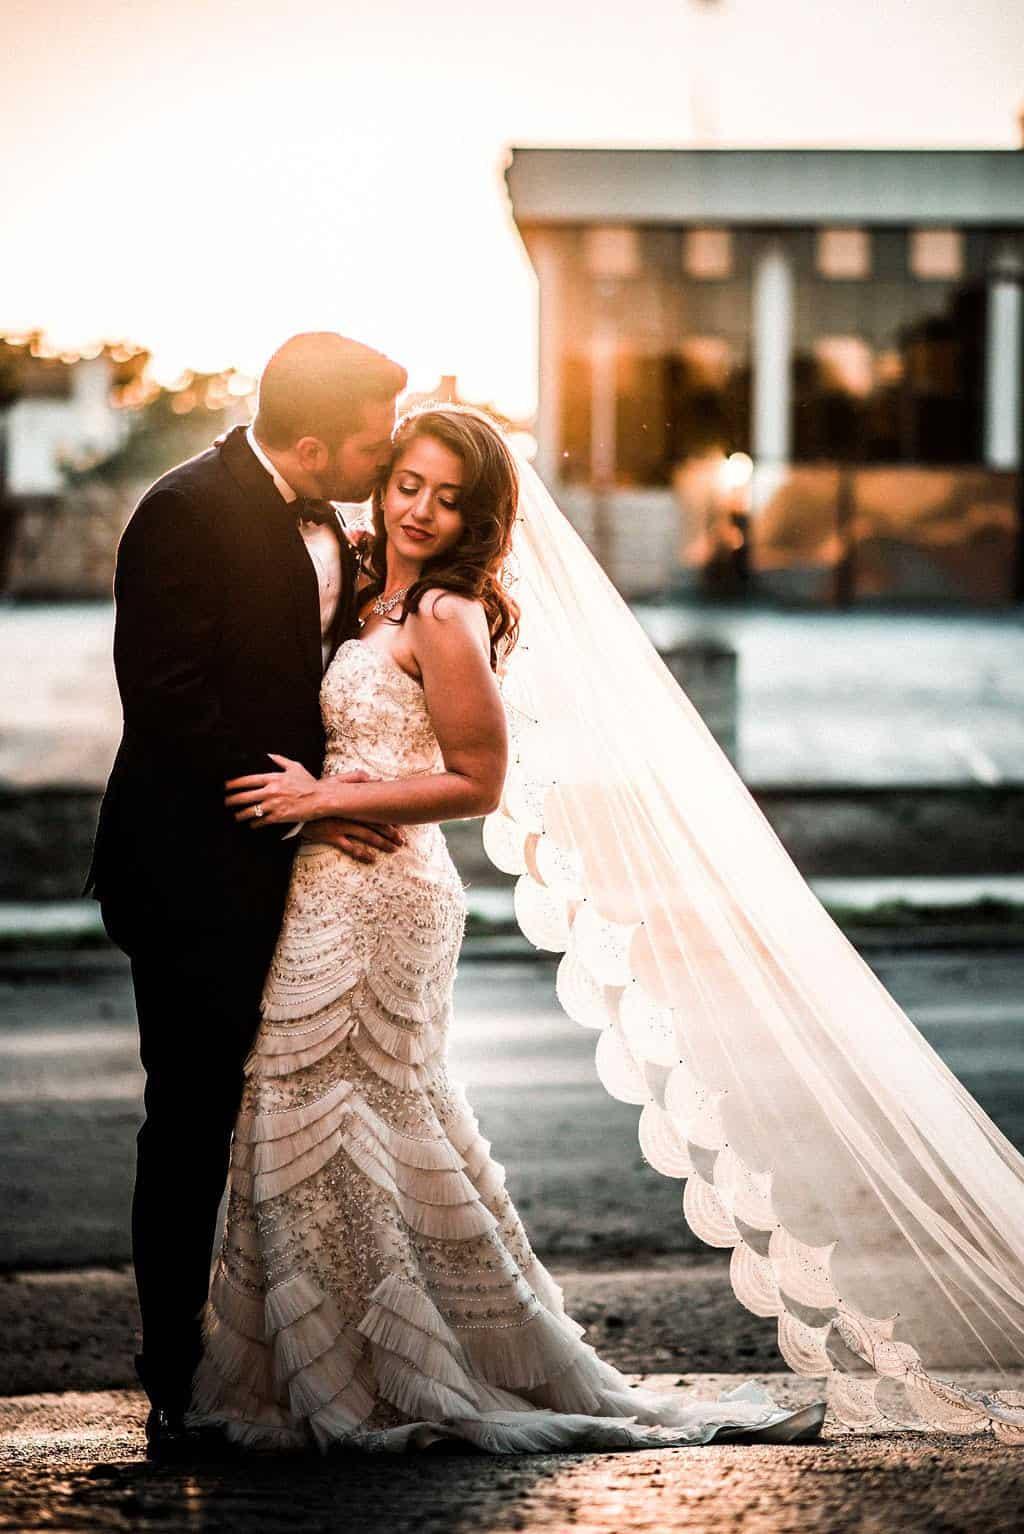 Loose Mansion | Kansas City Wedding | Heirloom Photo Company